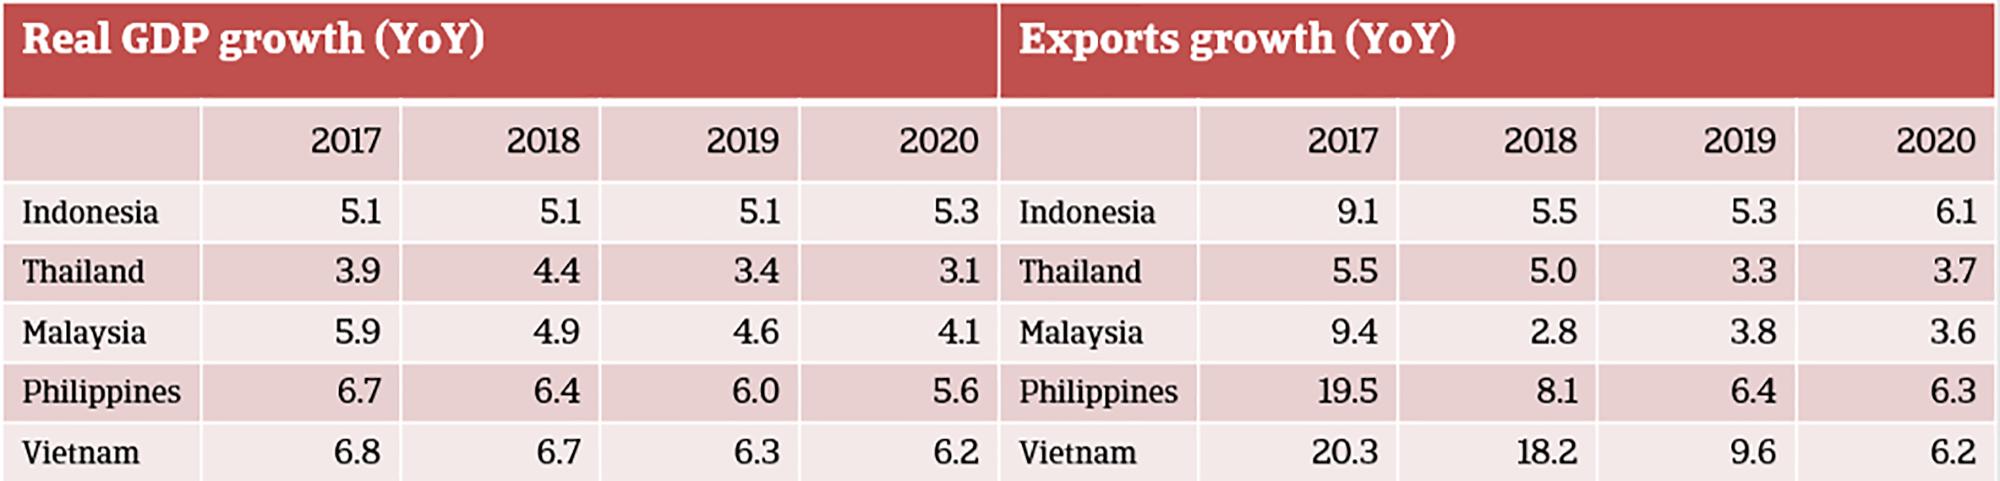 Moderate impact on economic growth